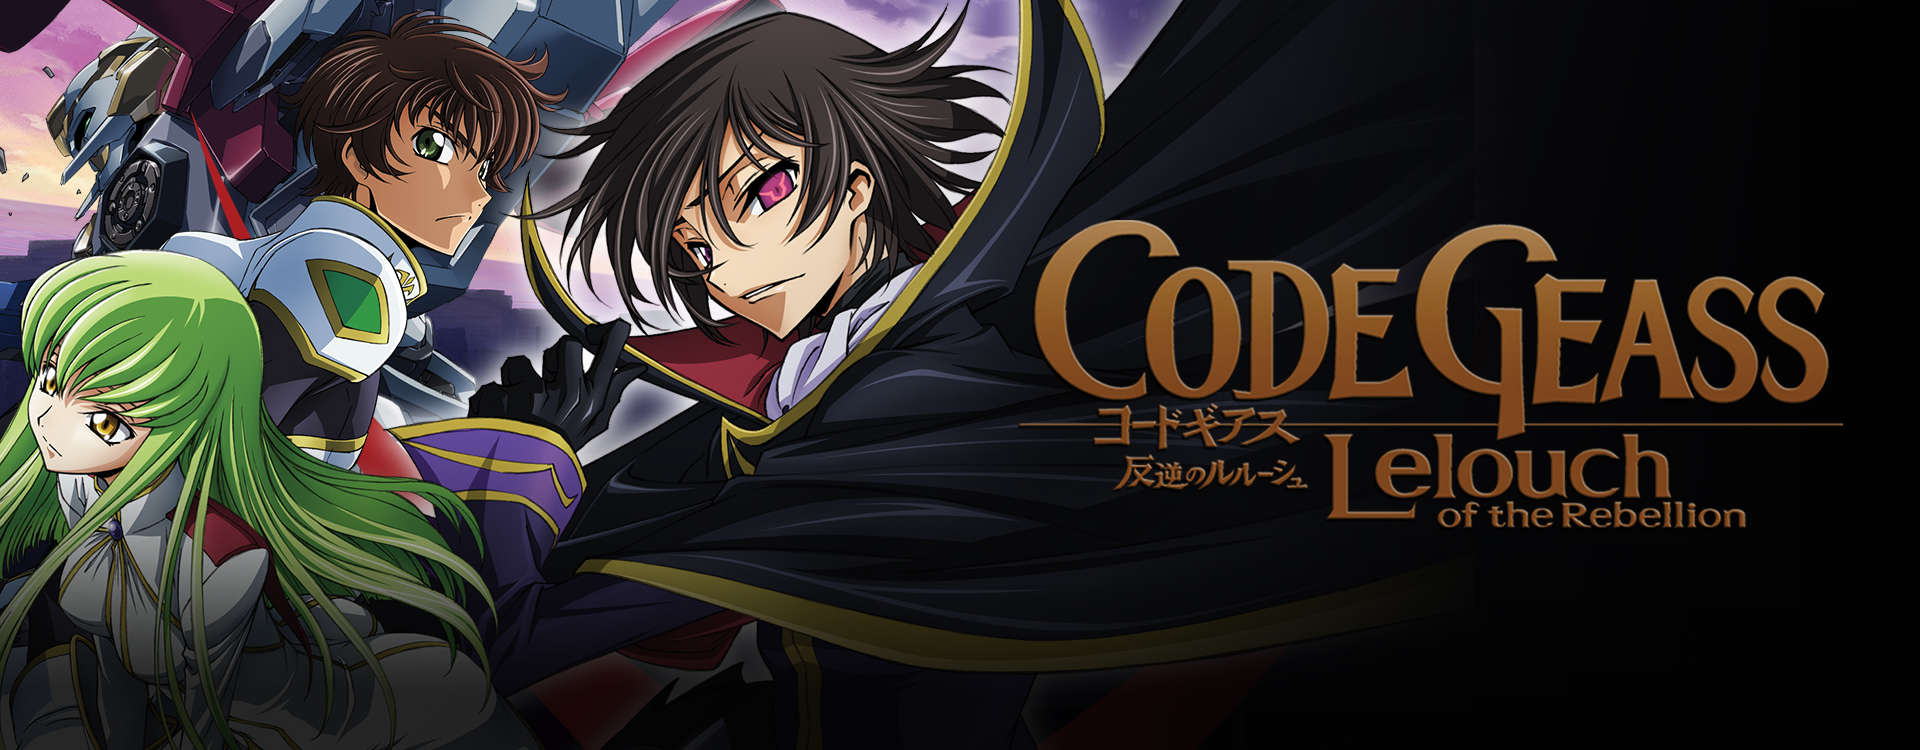 Code Geass : Hangyaku no Lelouch vostfr